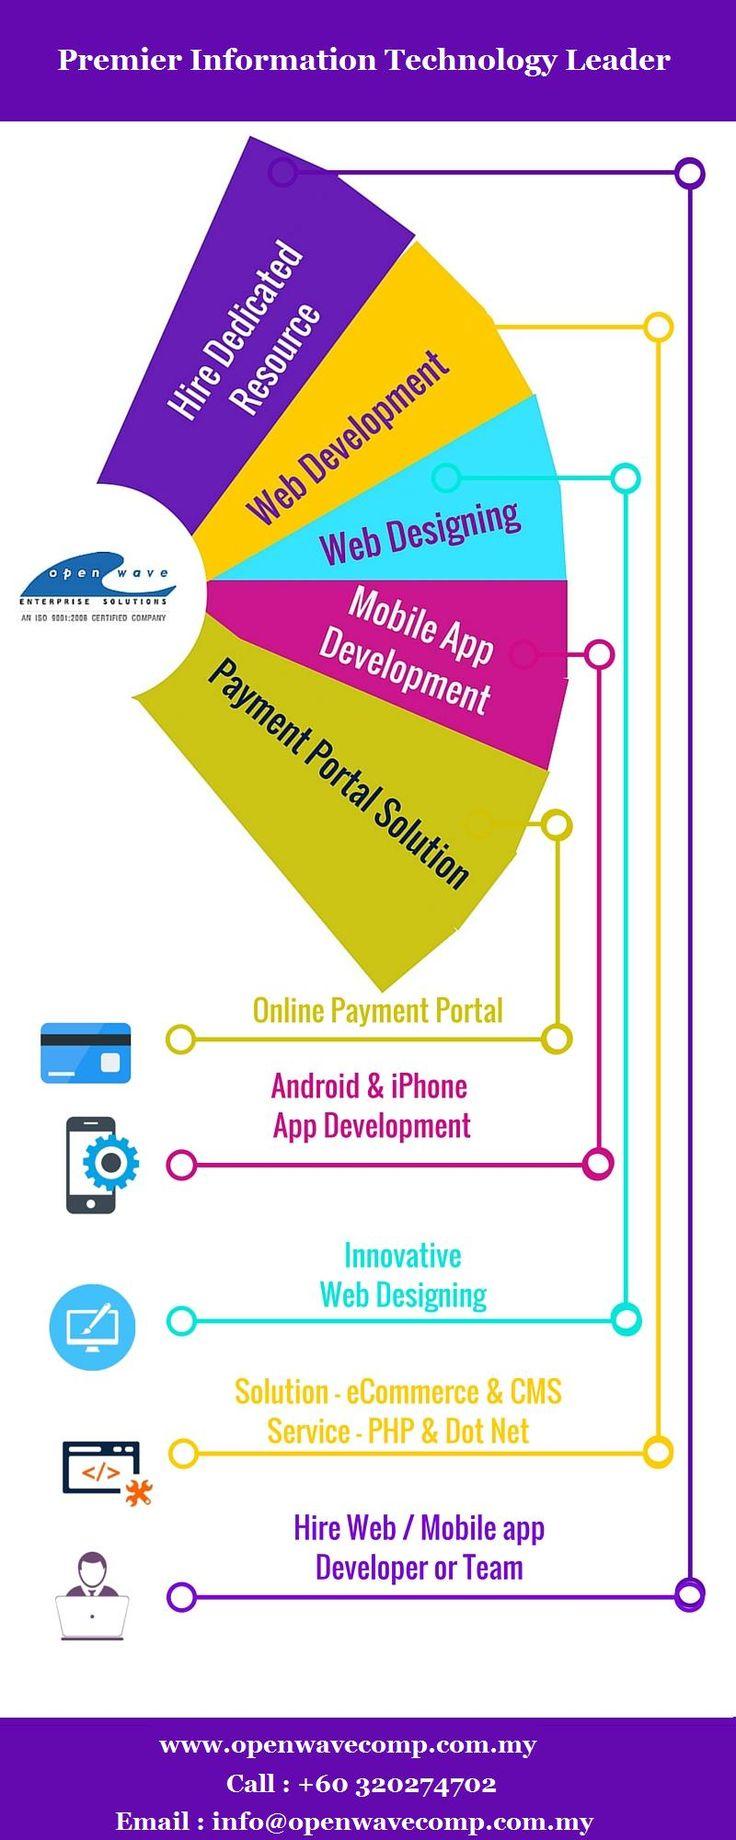 #Web and #Mobile Application Development in Kuala Lumpur | Malaysia - http://www.openwavecomp.com.my/